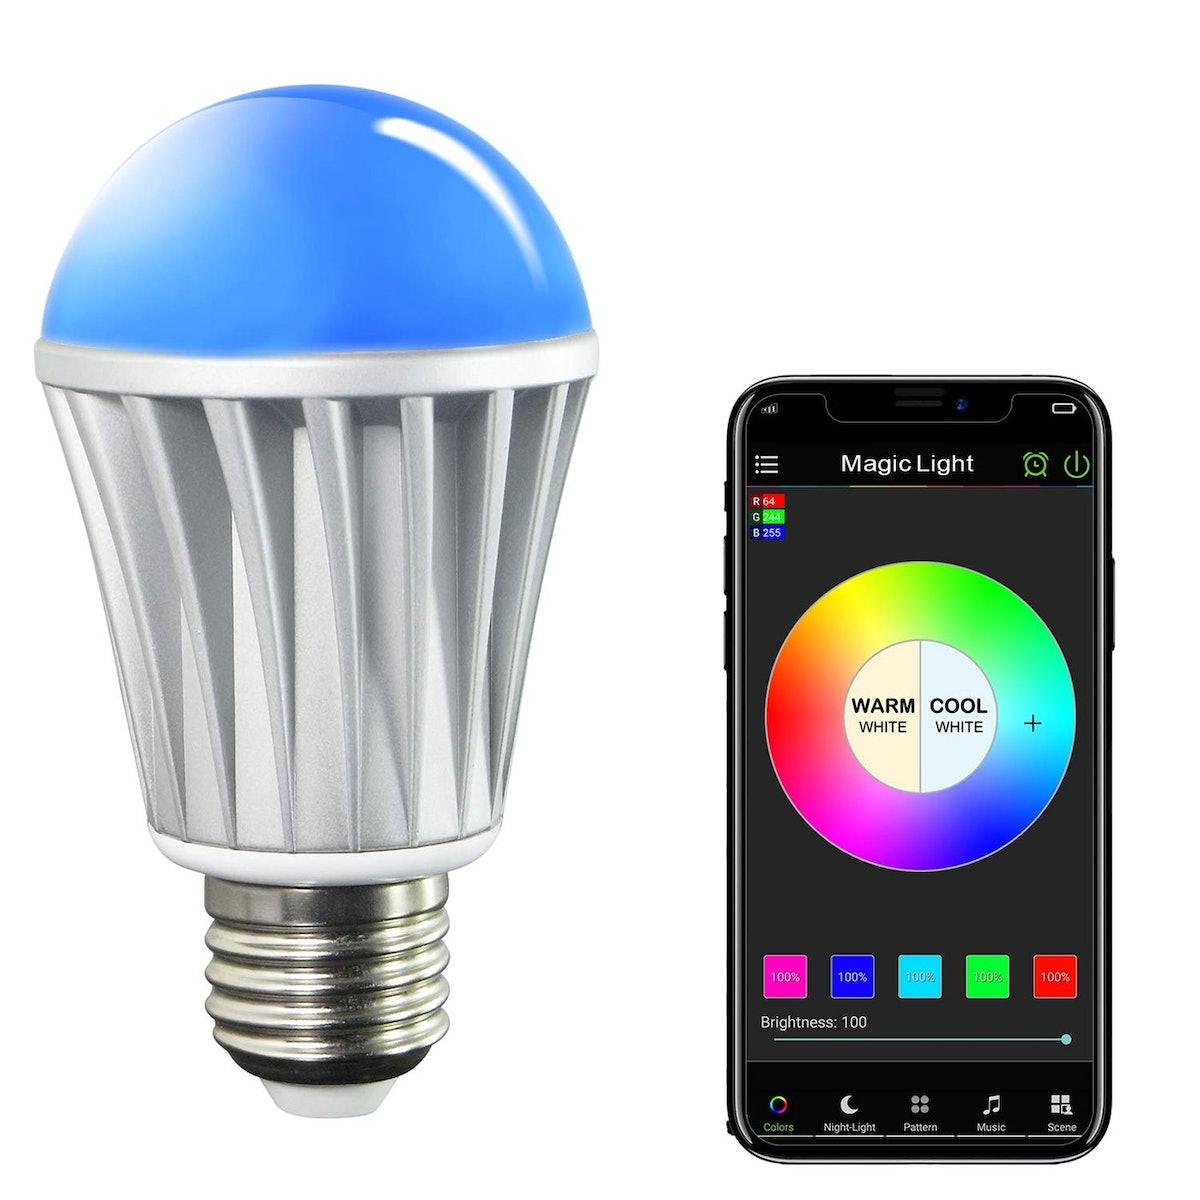 MagicLight Bluetooth Smart Lightbulb